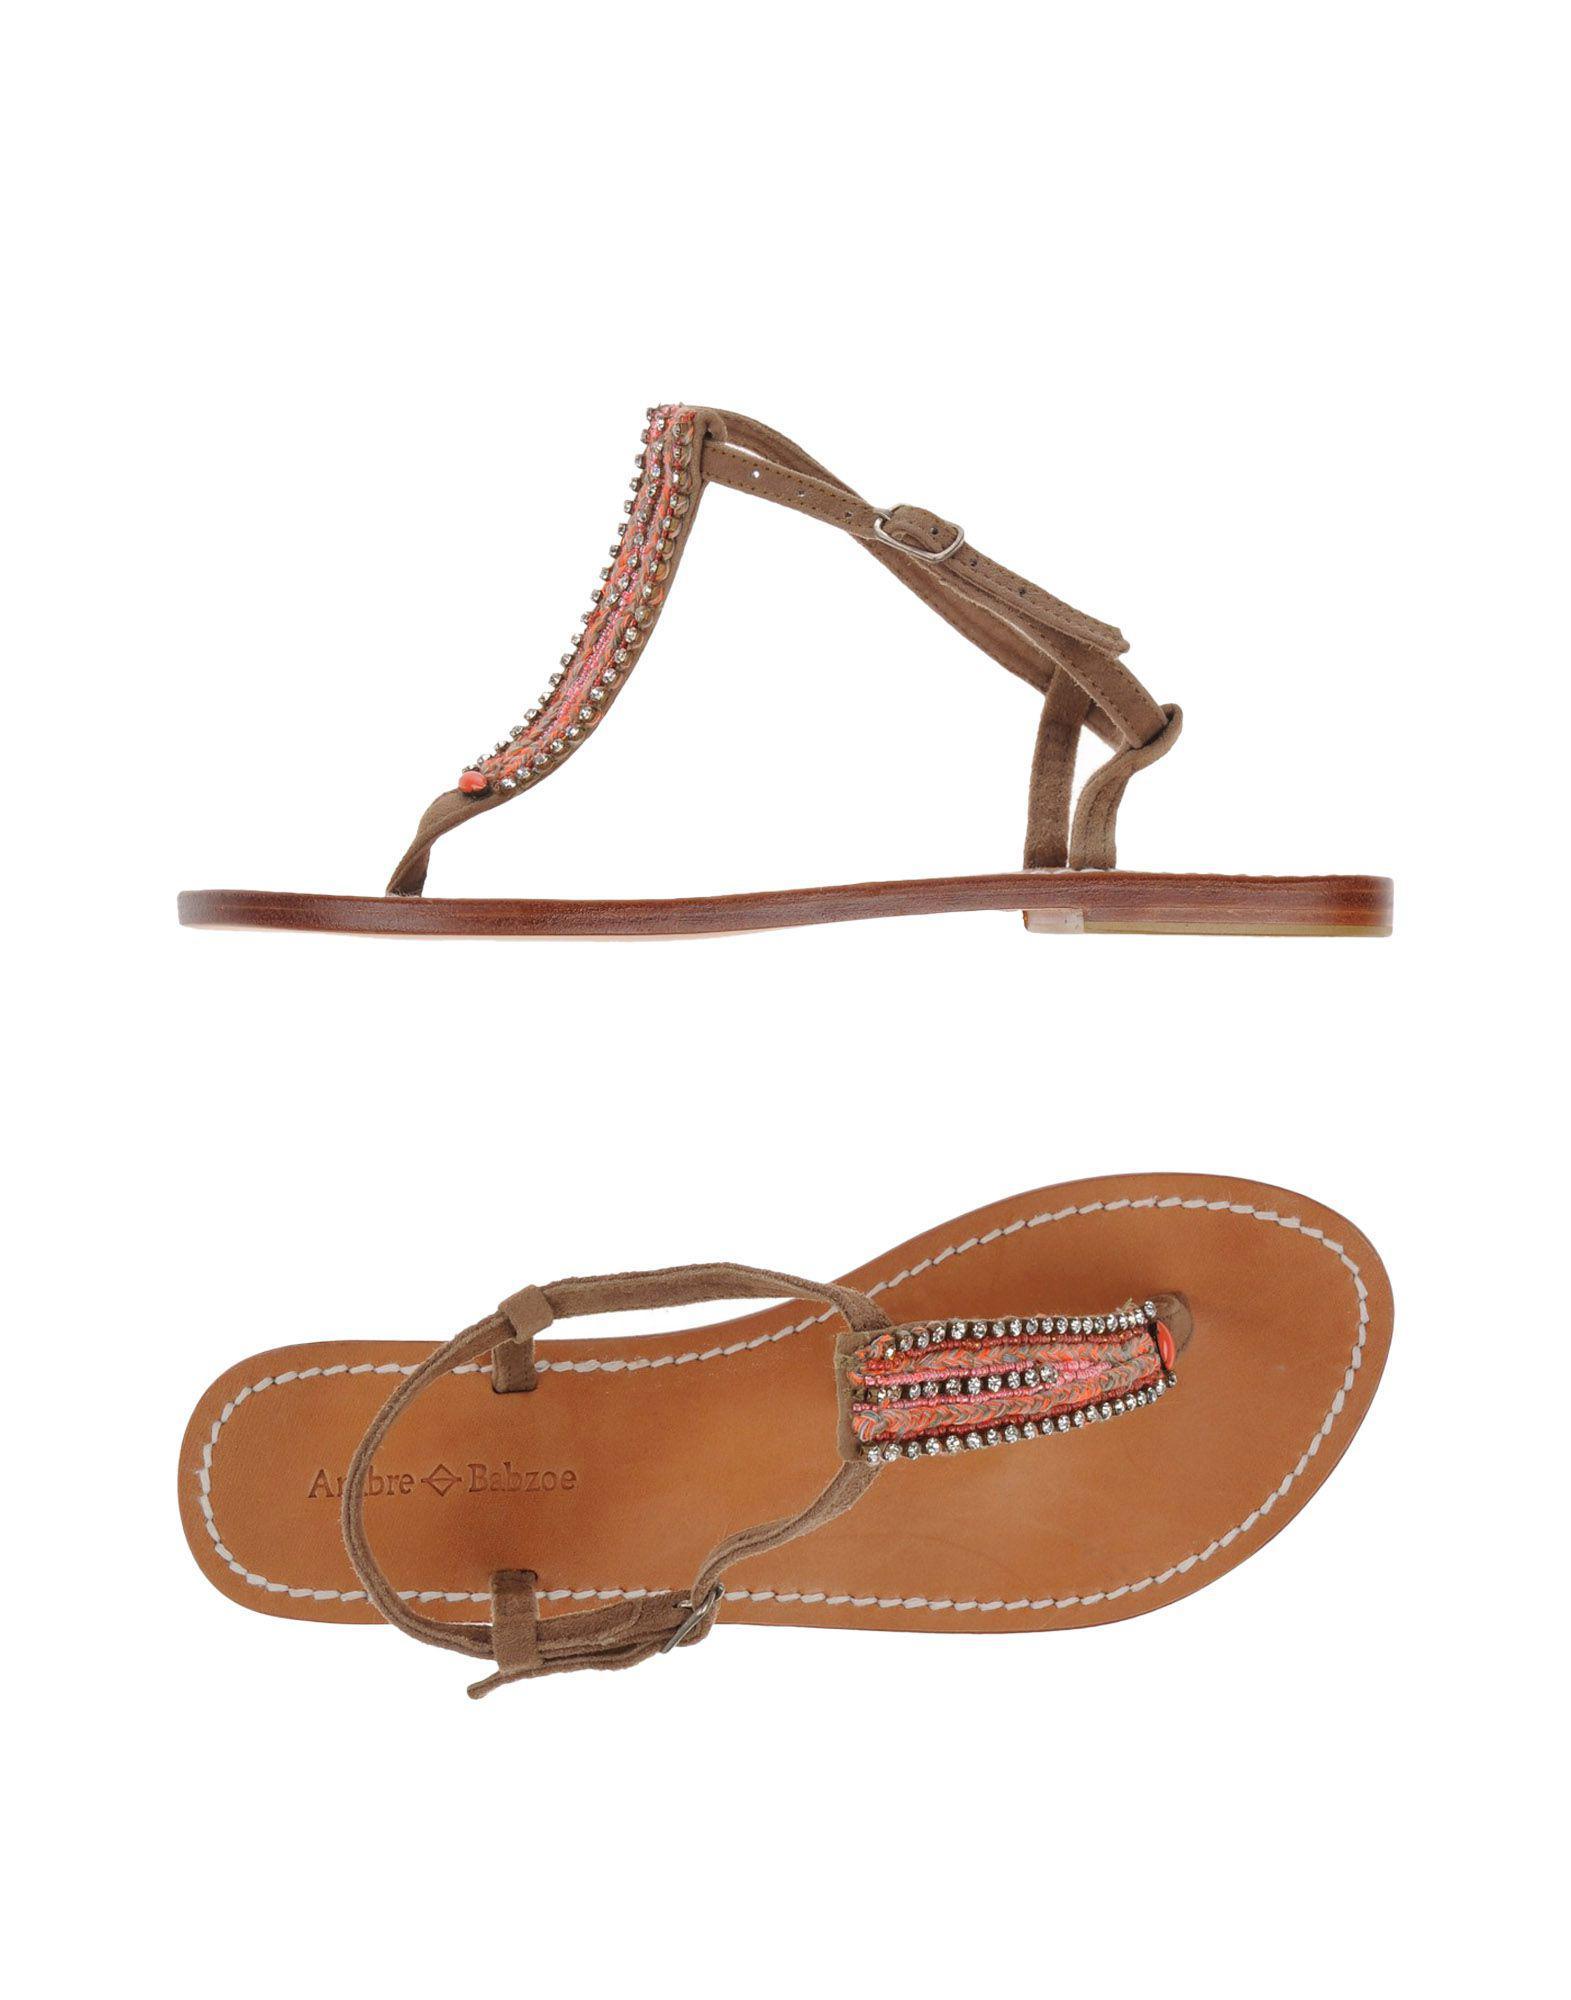 Chaussures - Sandales Entredoigt De Babzoe Ambre gEDN06K